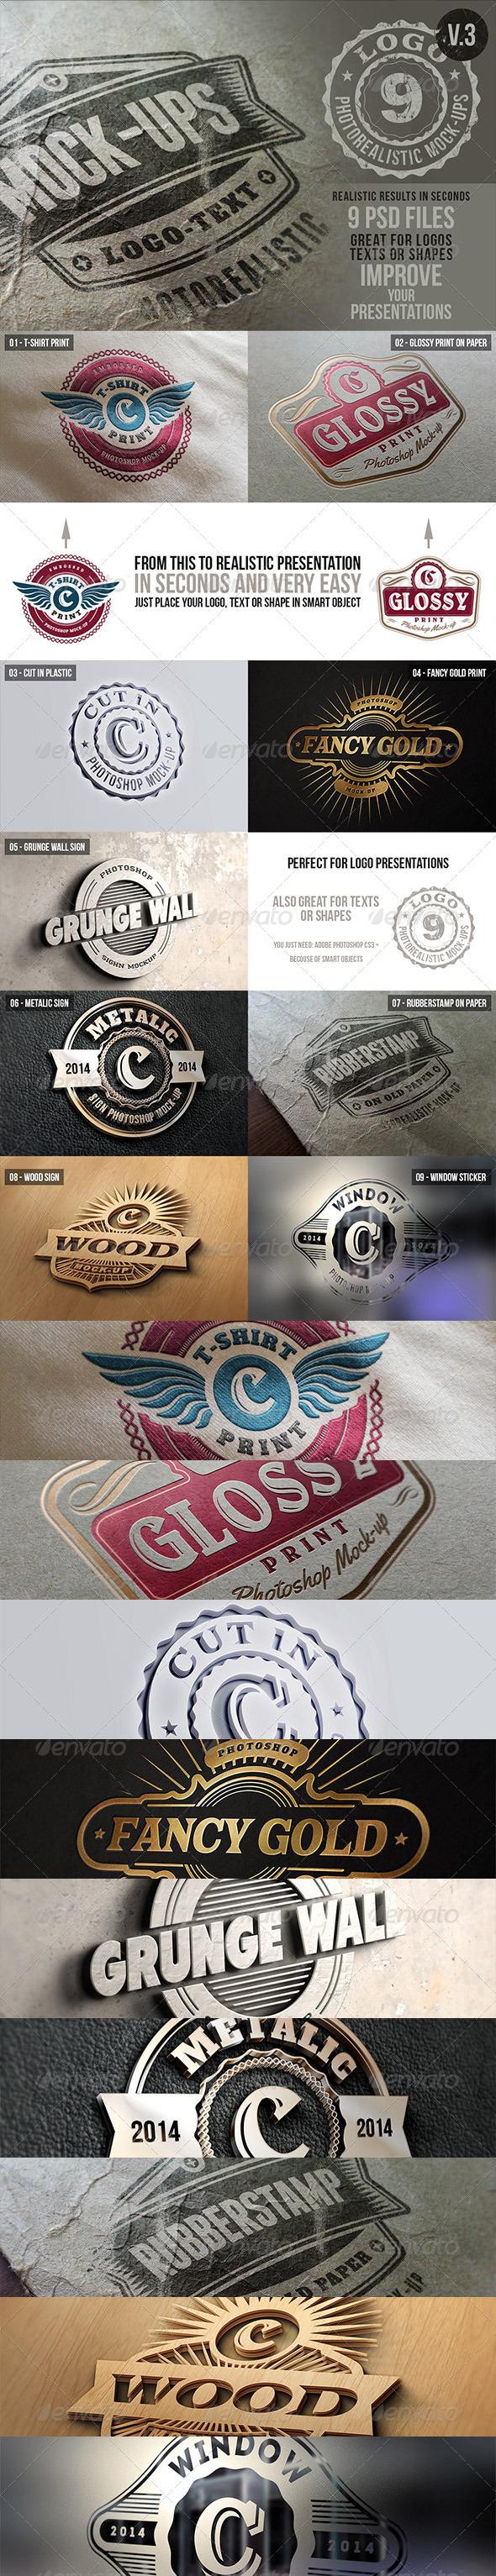 Photorealistic Logo Mock-Ups Vol.3 - Logo Product Mock-Ups